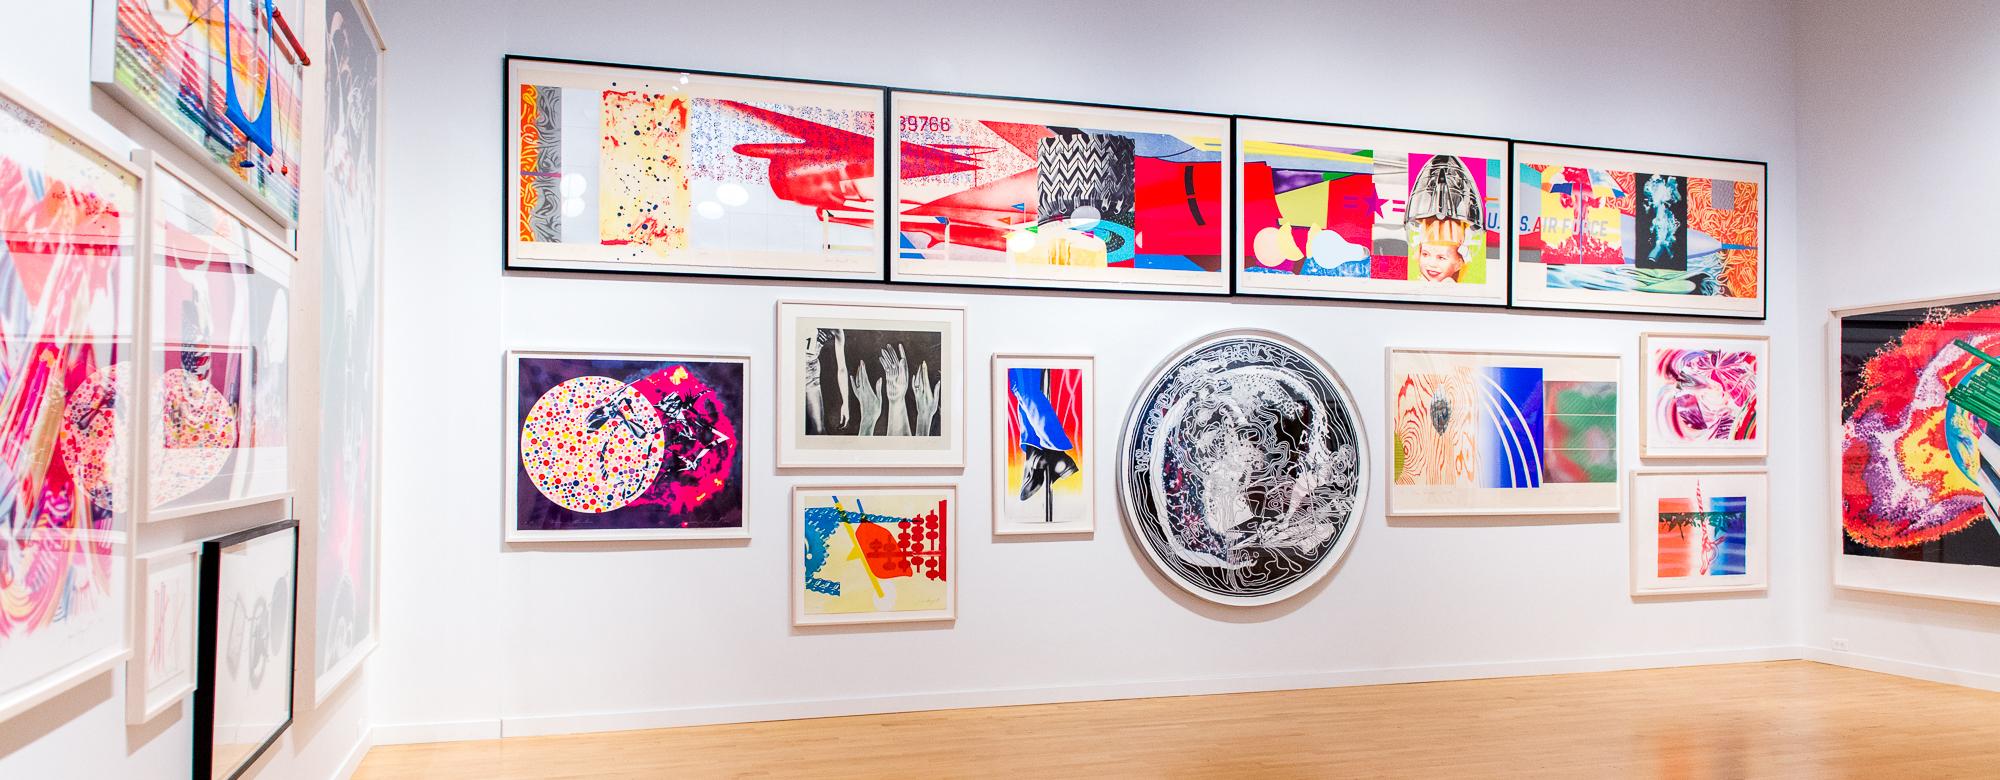 Lifetime Achievement Award Exhibition: James Rosenquist //  Pacific Northwest College of Art, 2016